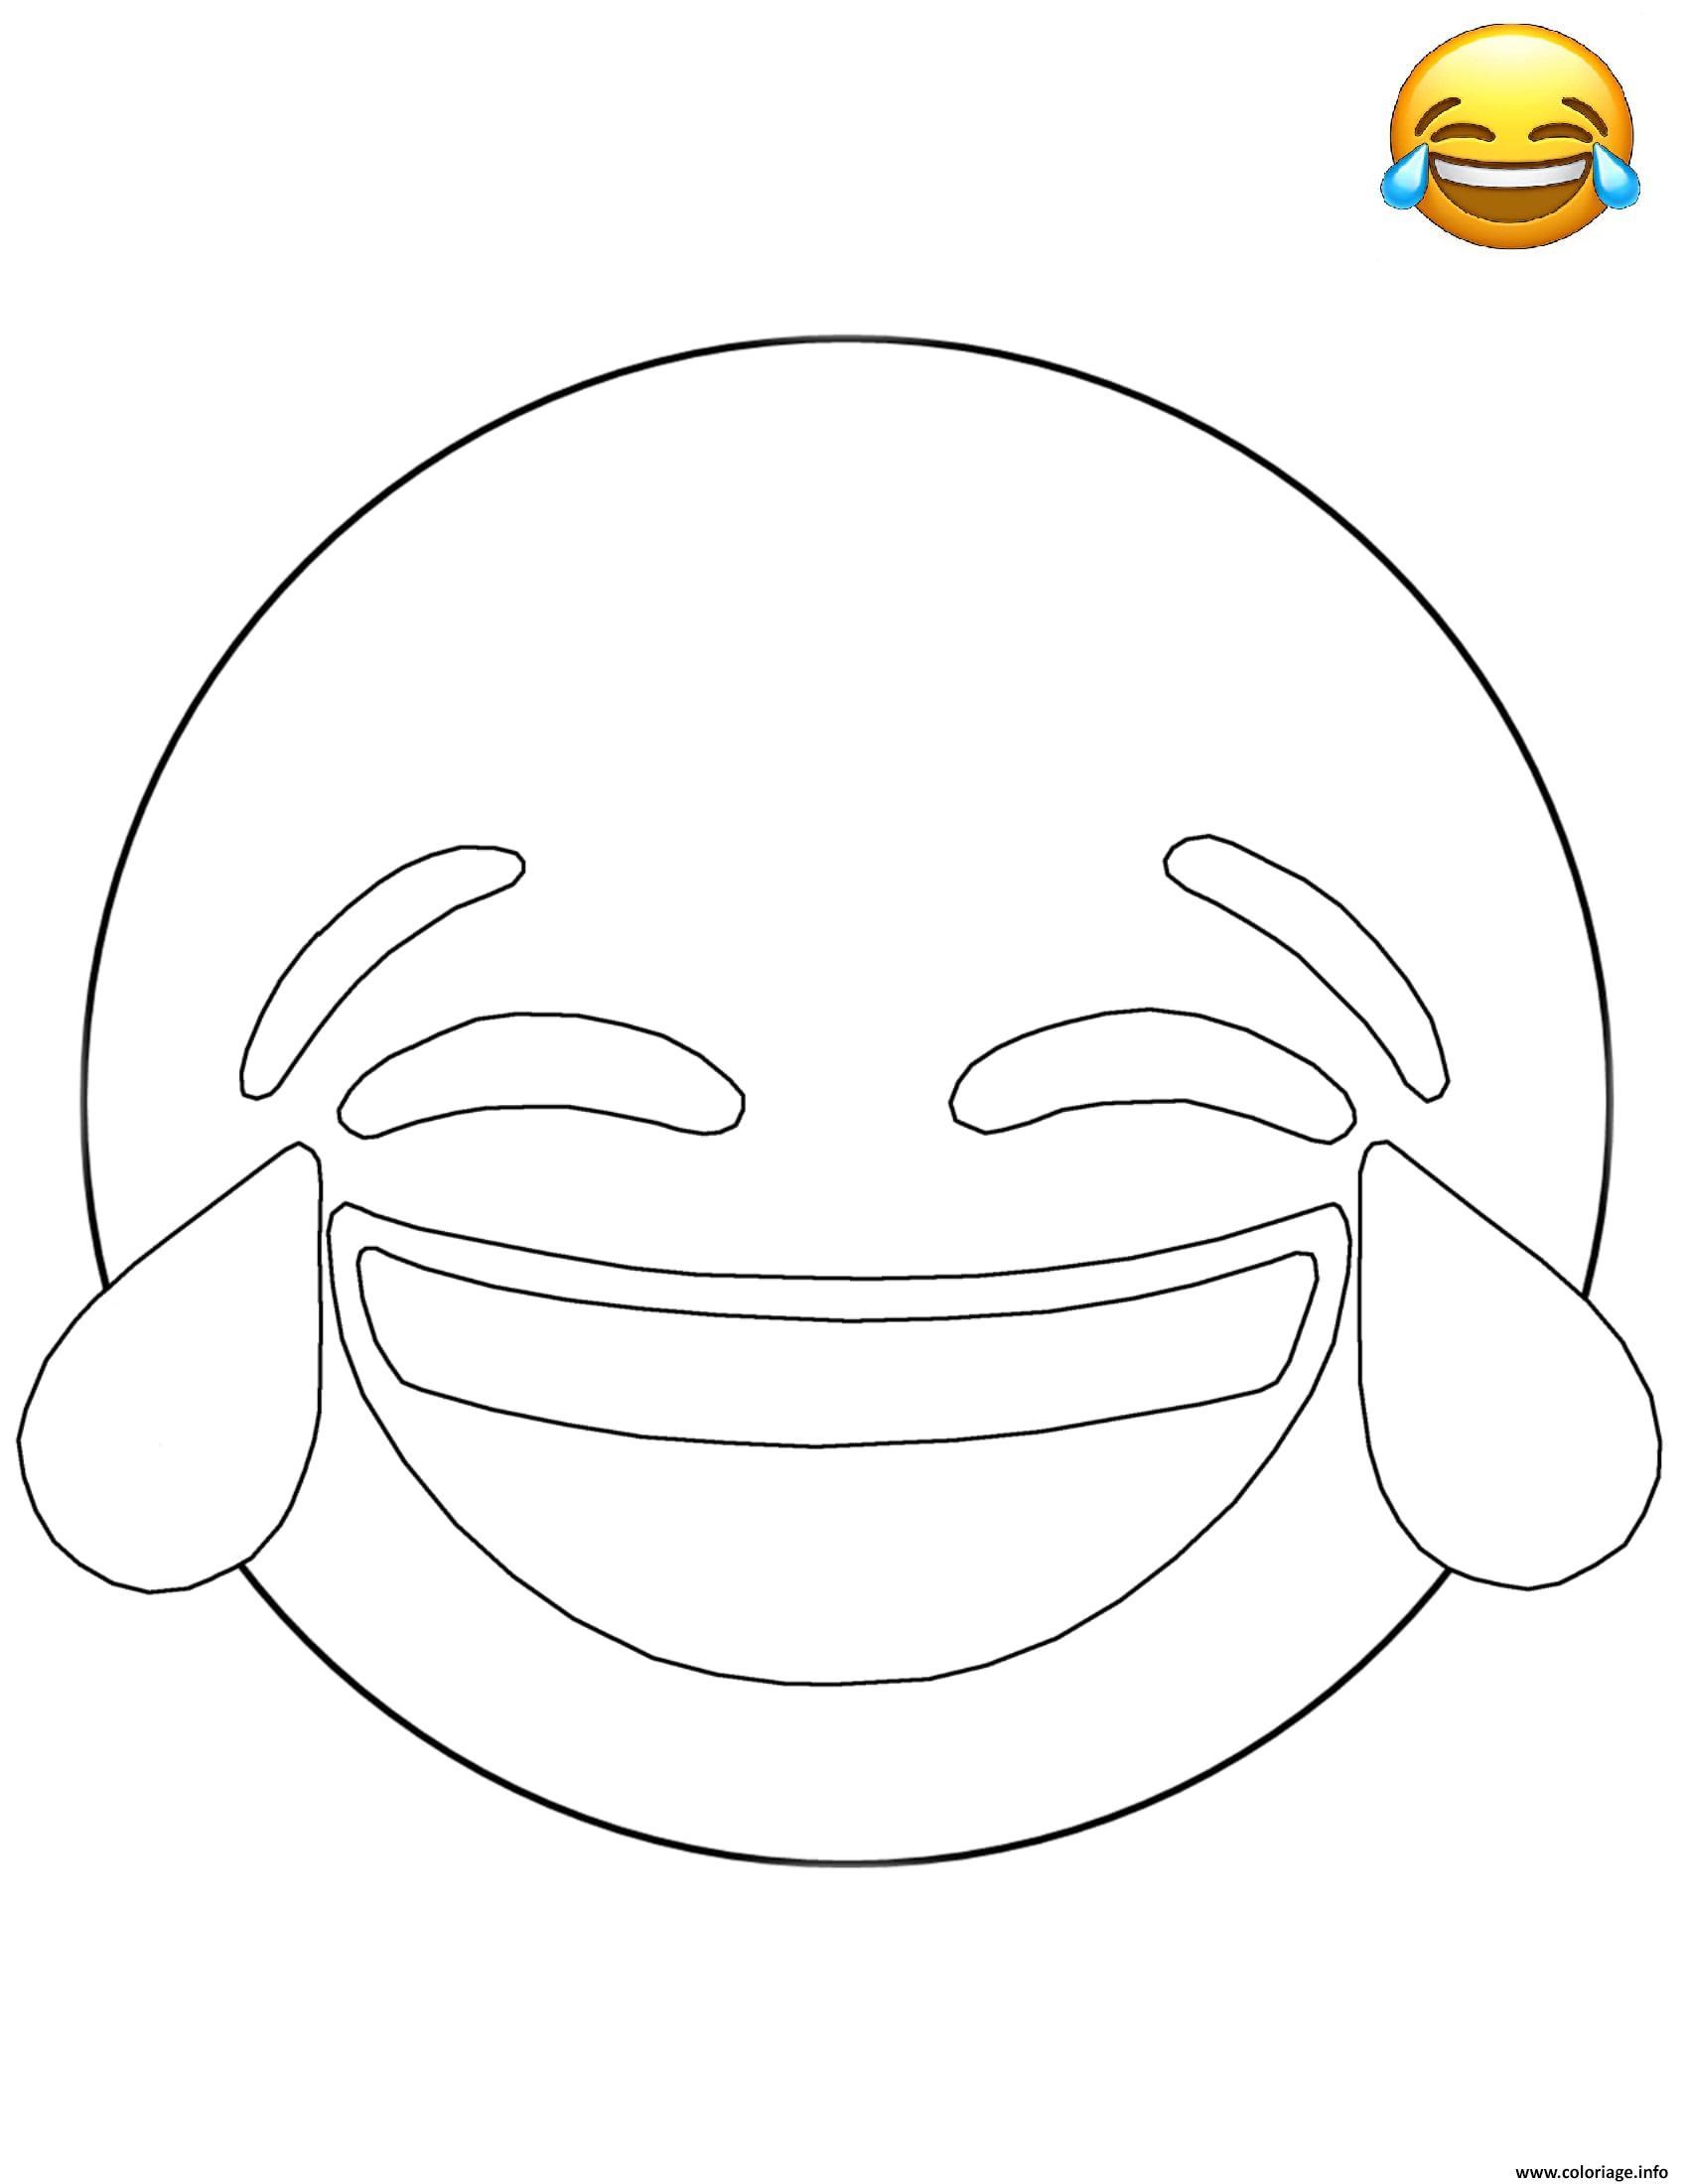 Coloriage Emoji Tears Of Joy Smiley Jecolorie Com